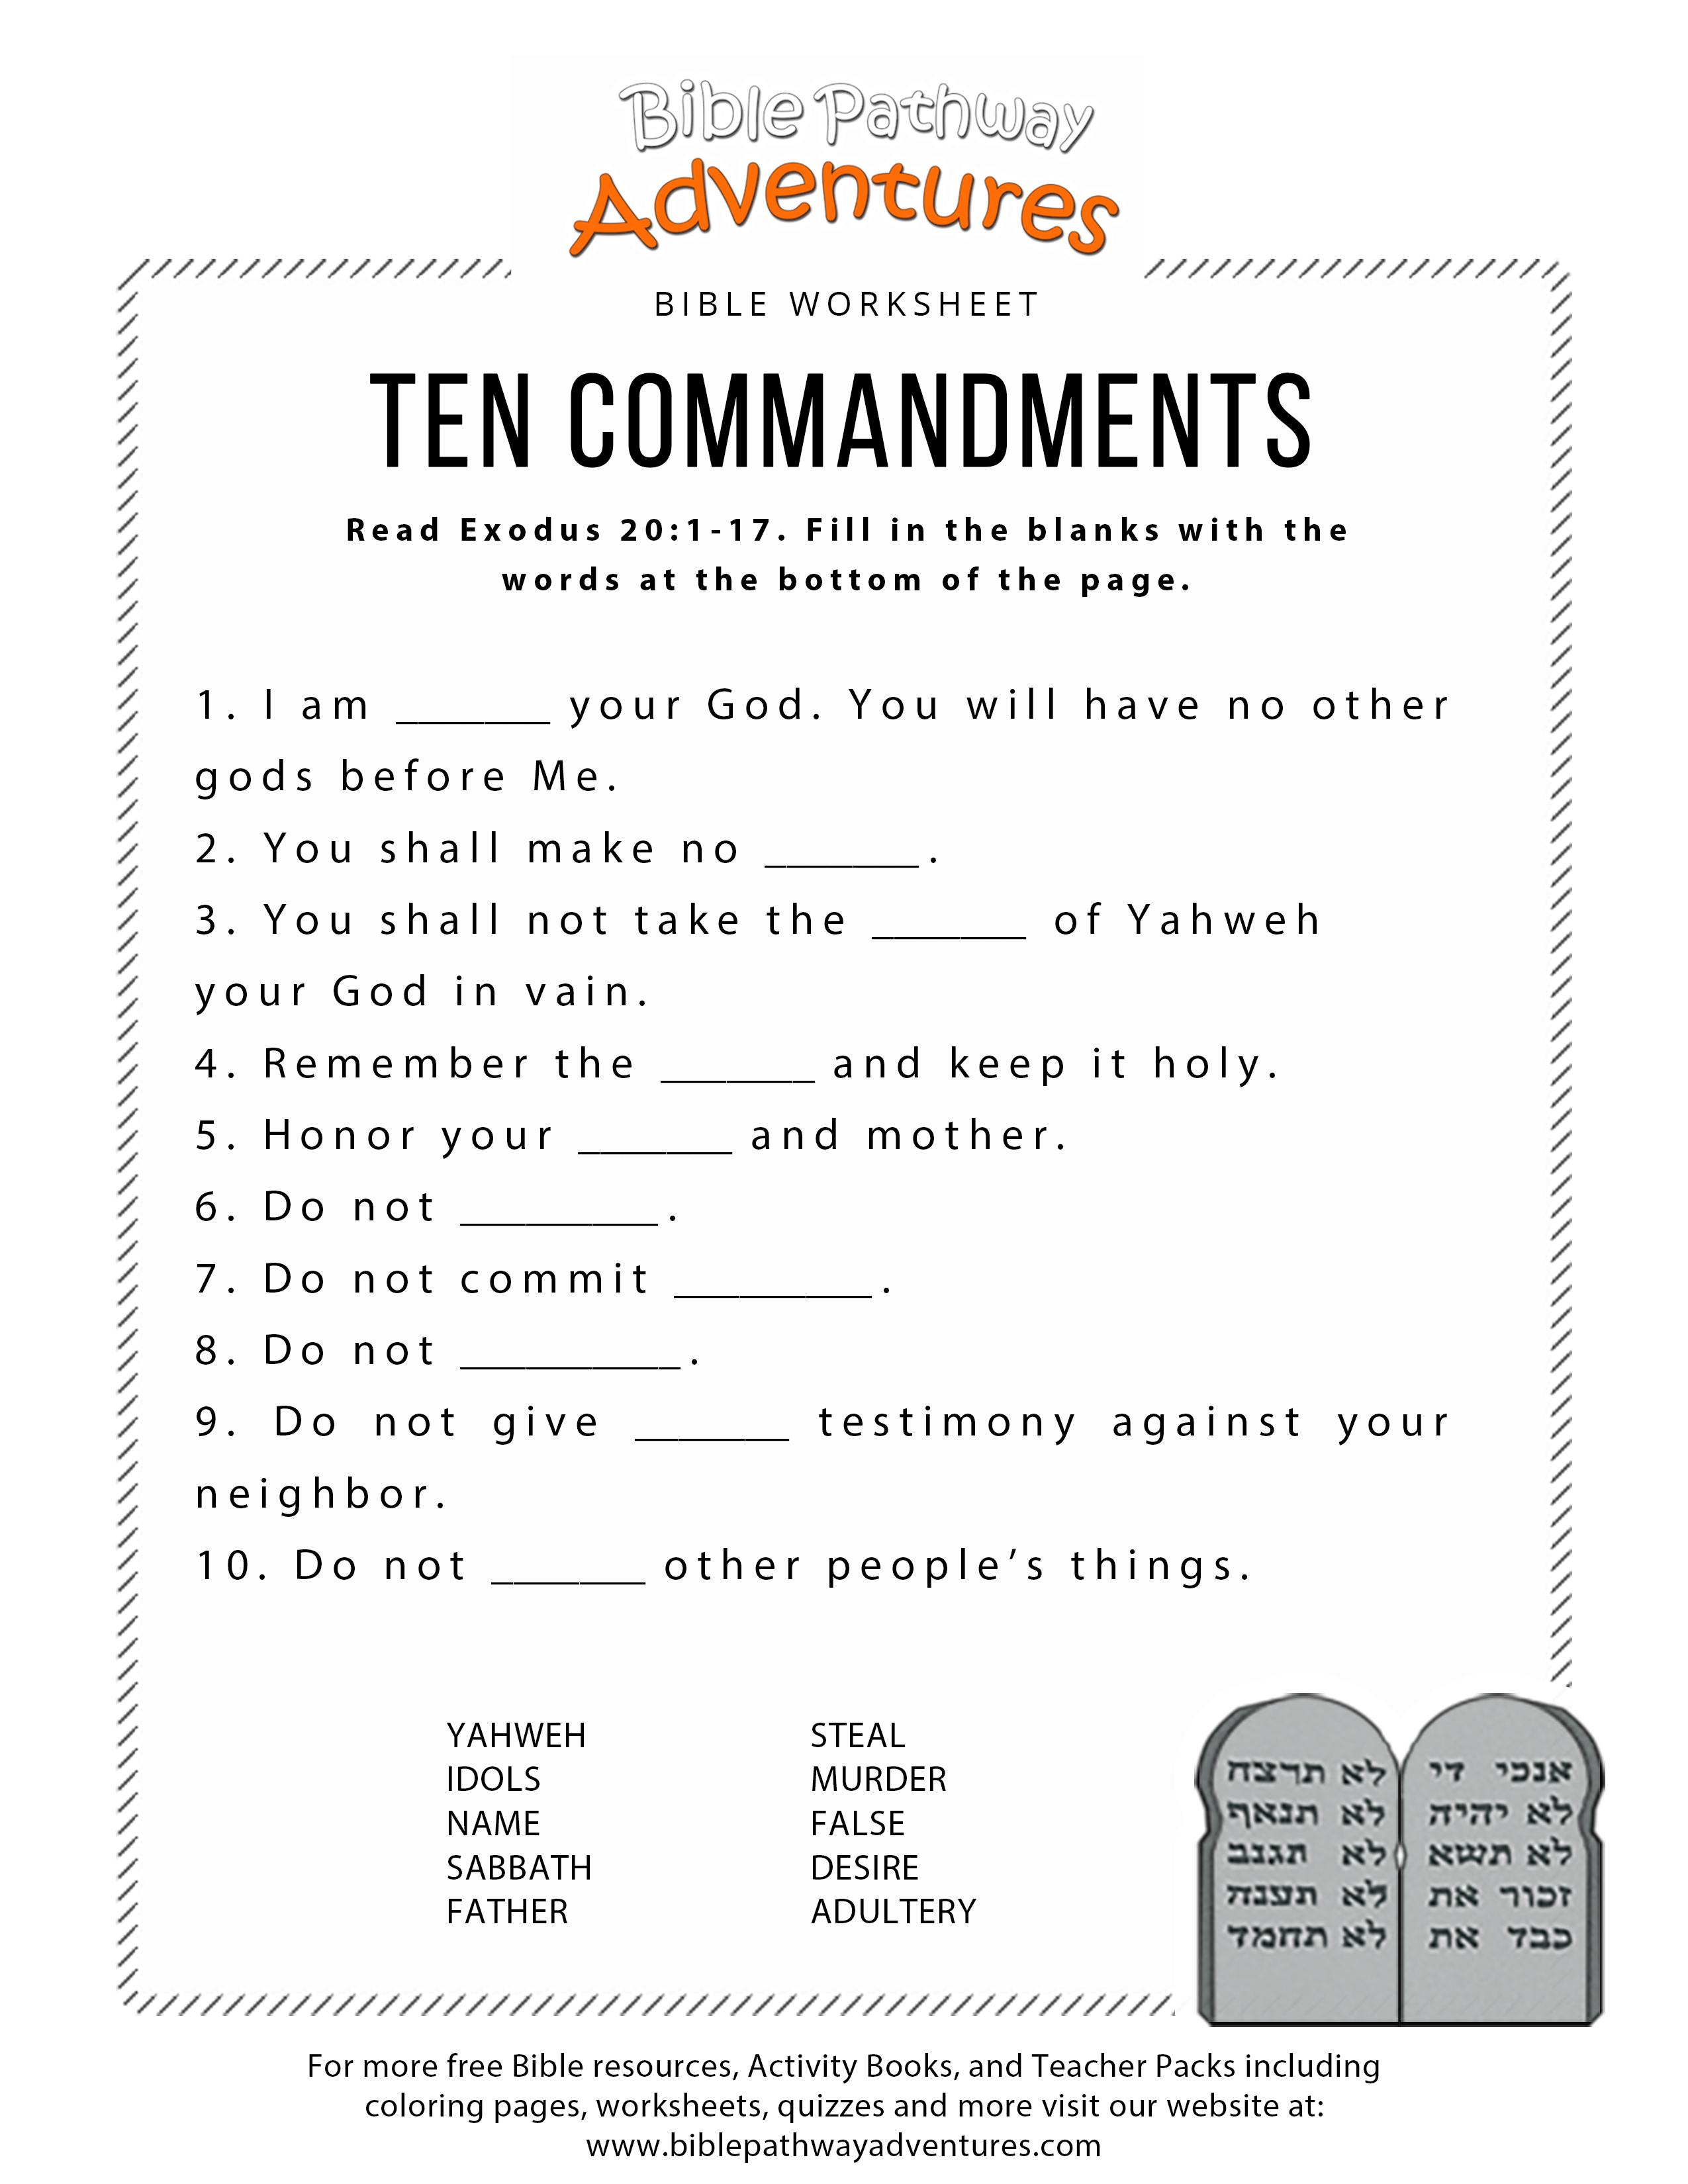 Ten Commandments Worksheet For Kids | Worksheets For Psr | Bible - Free Printable Ten Commandments Coloring Pages